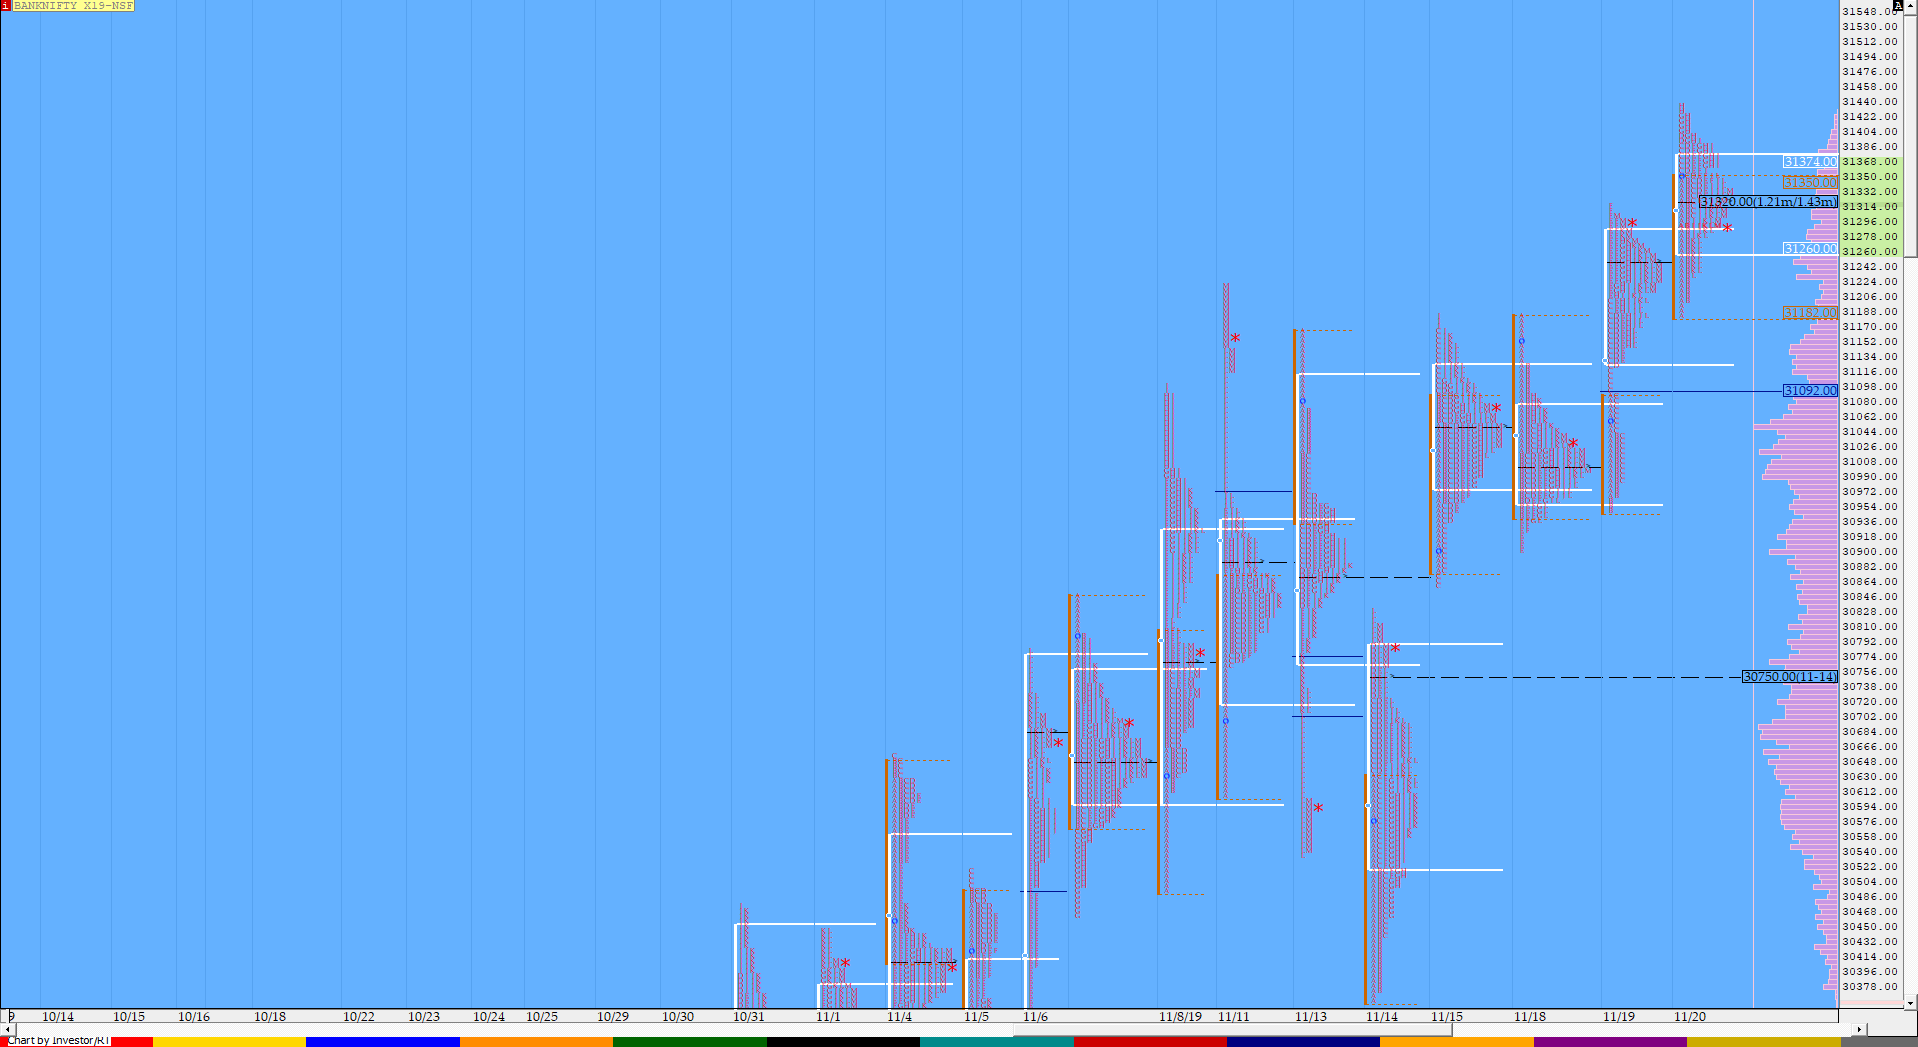 Market Profile Analysis dated 20th November 3